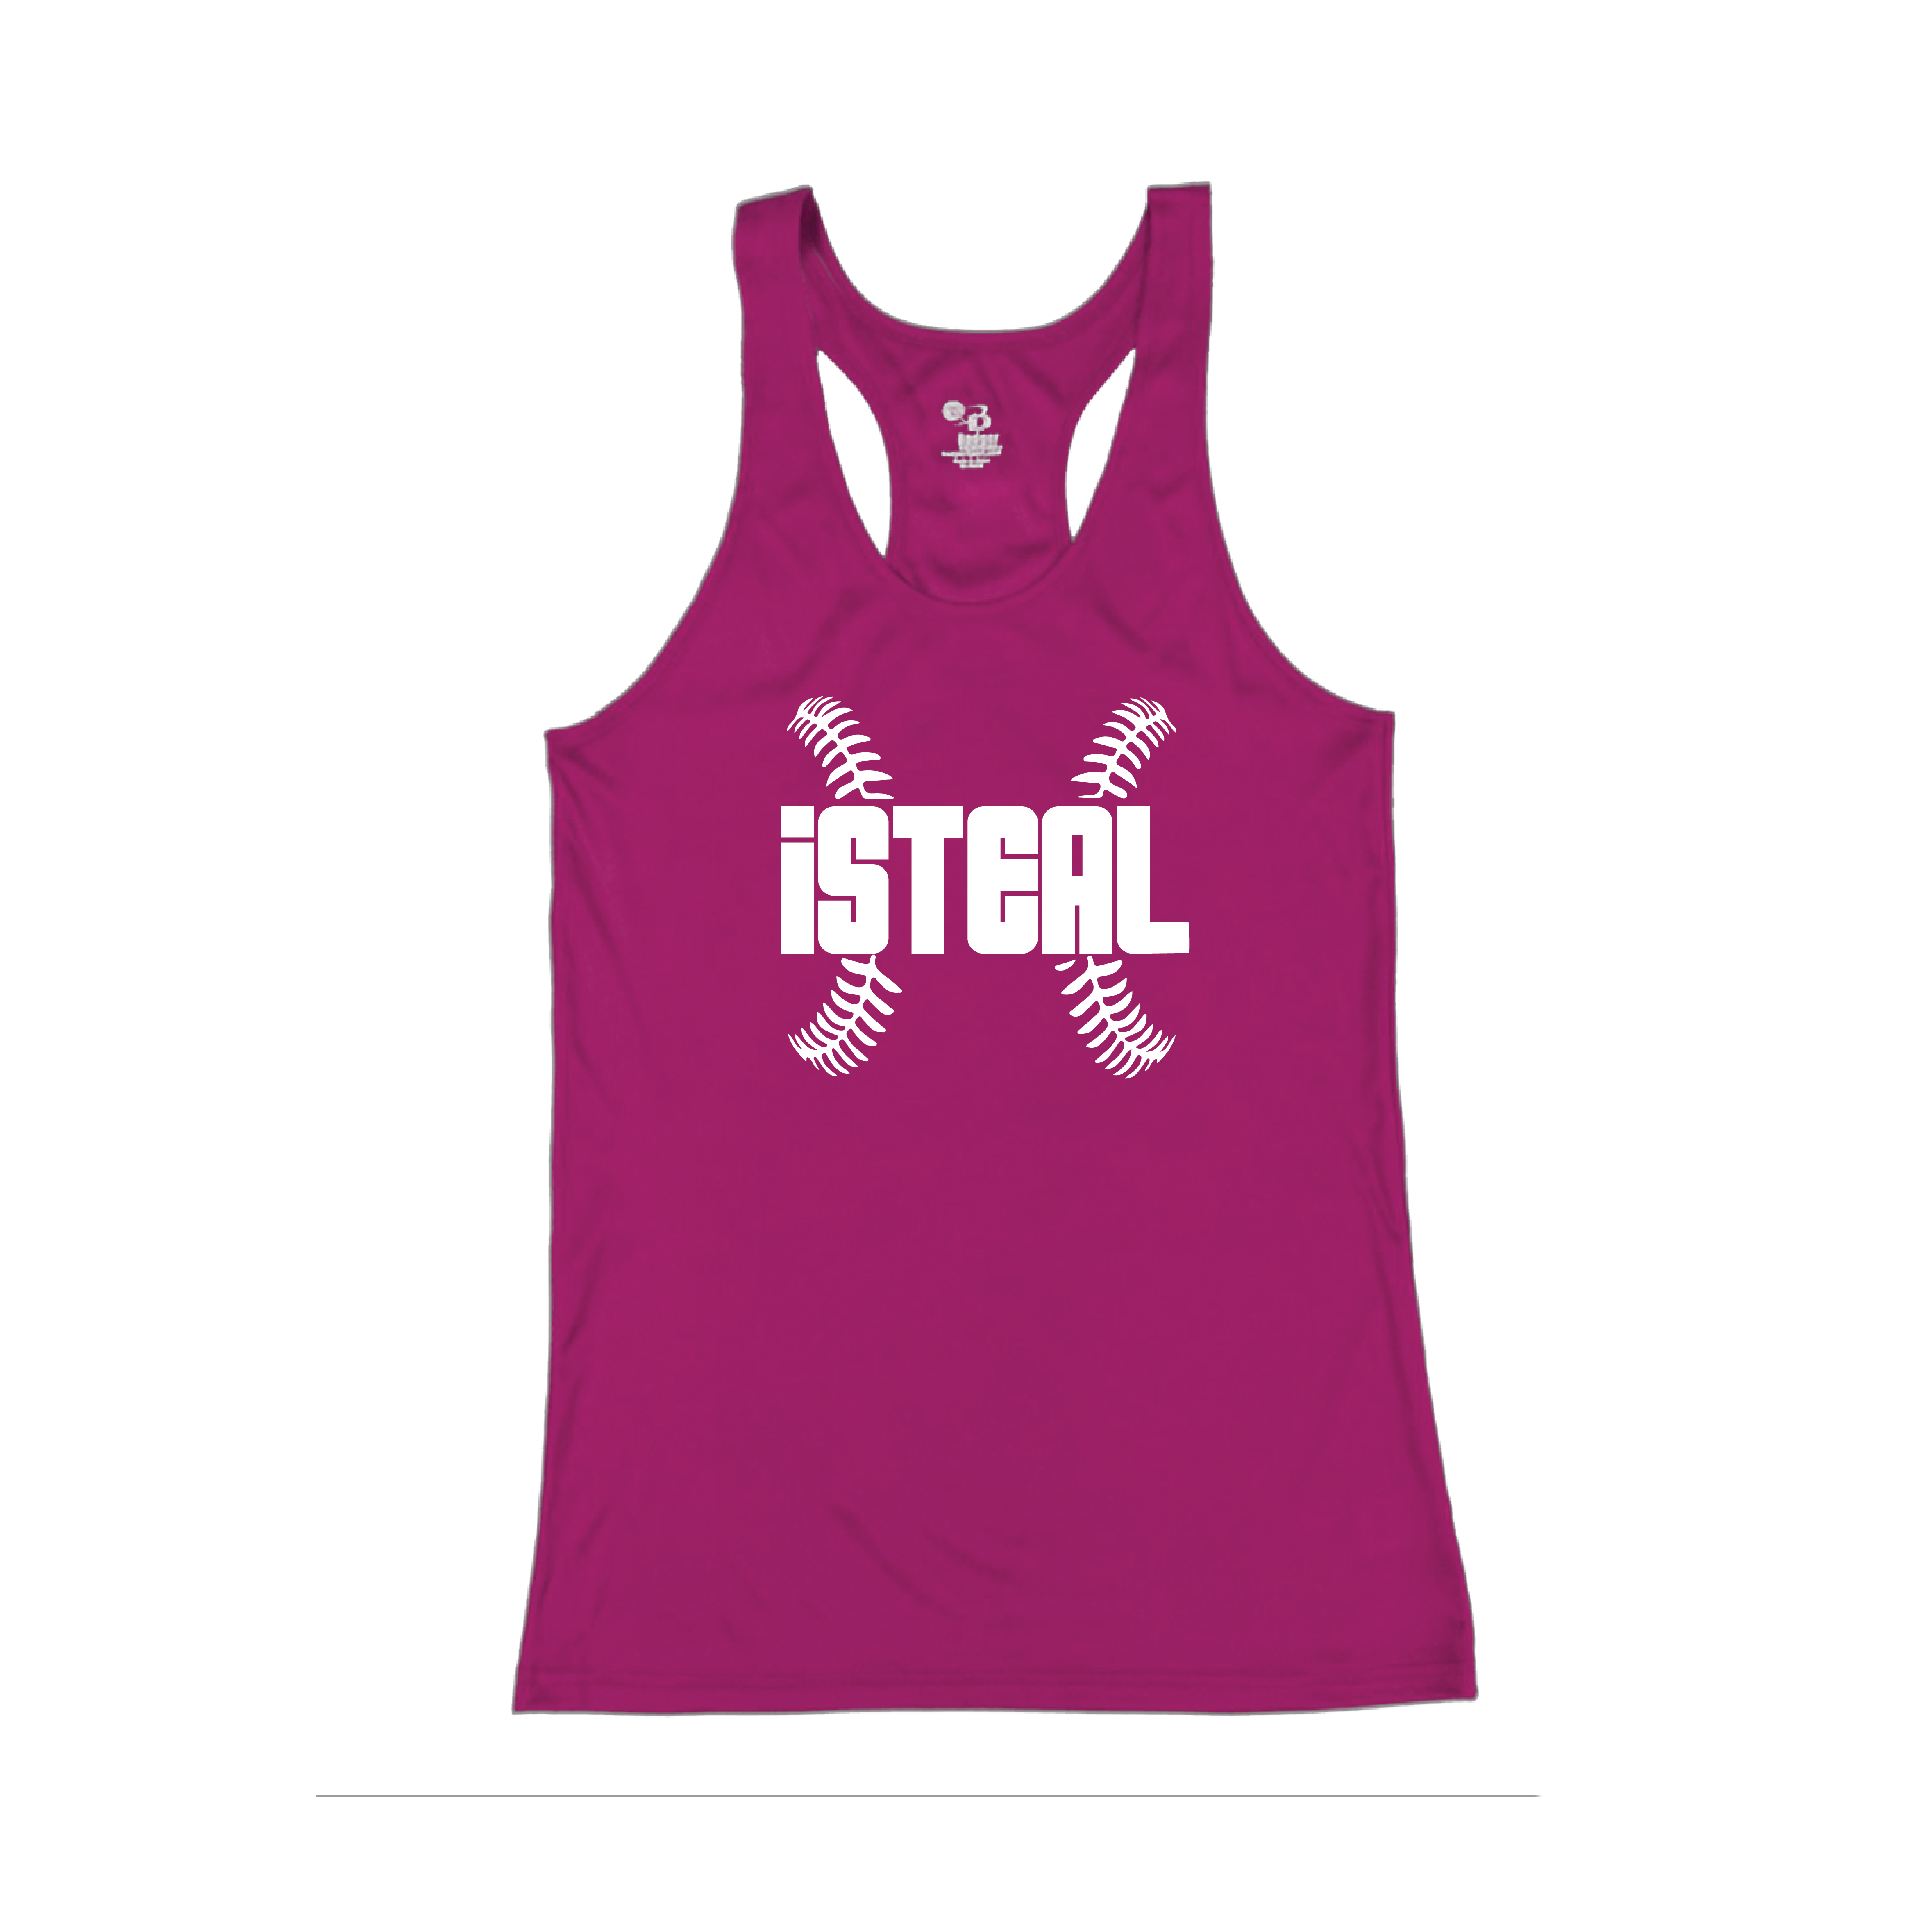 Softball pinkTank